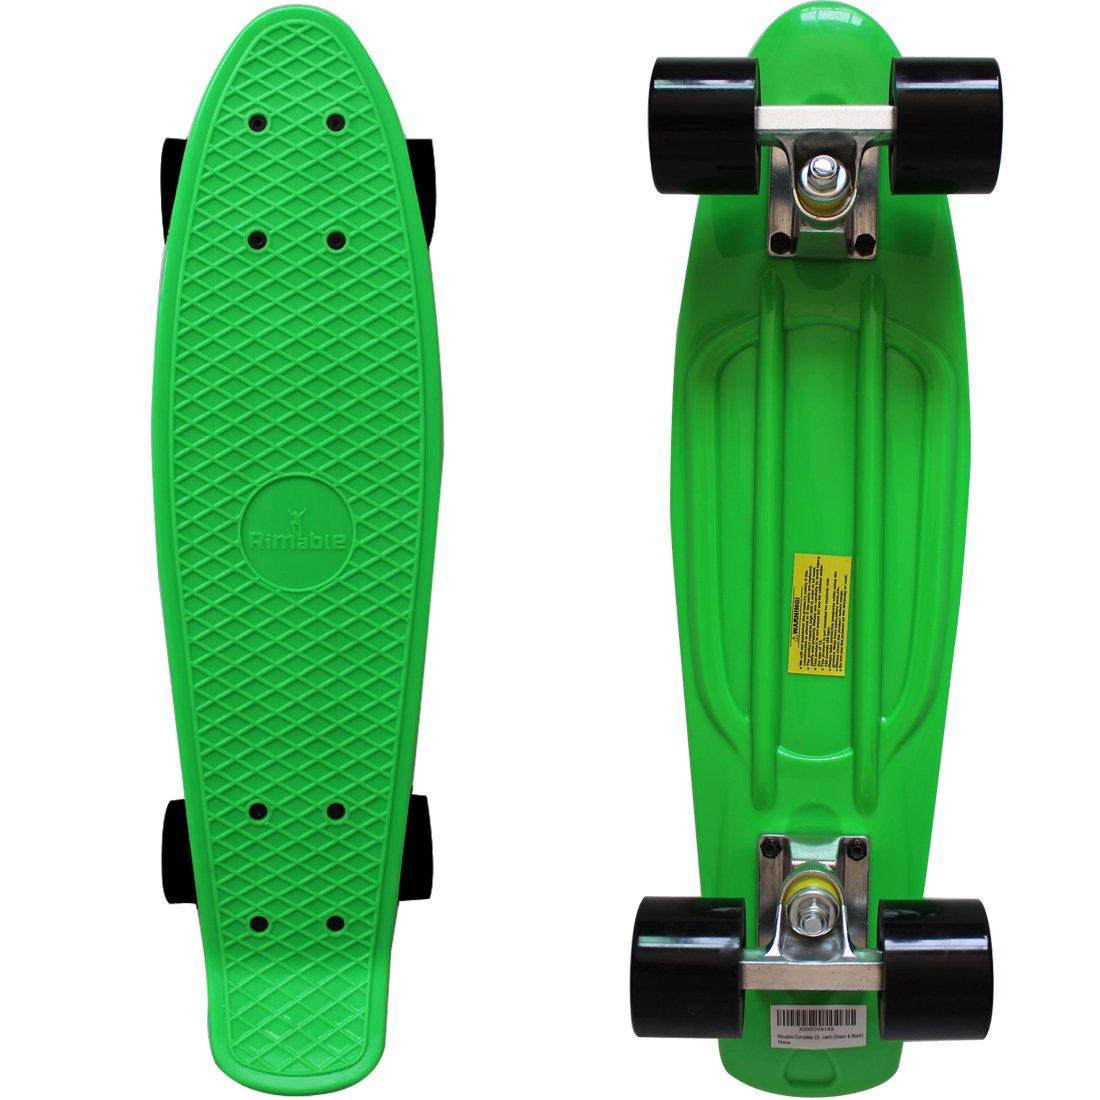 Rimable Complete 22'' Skateboard (Green & Black)